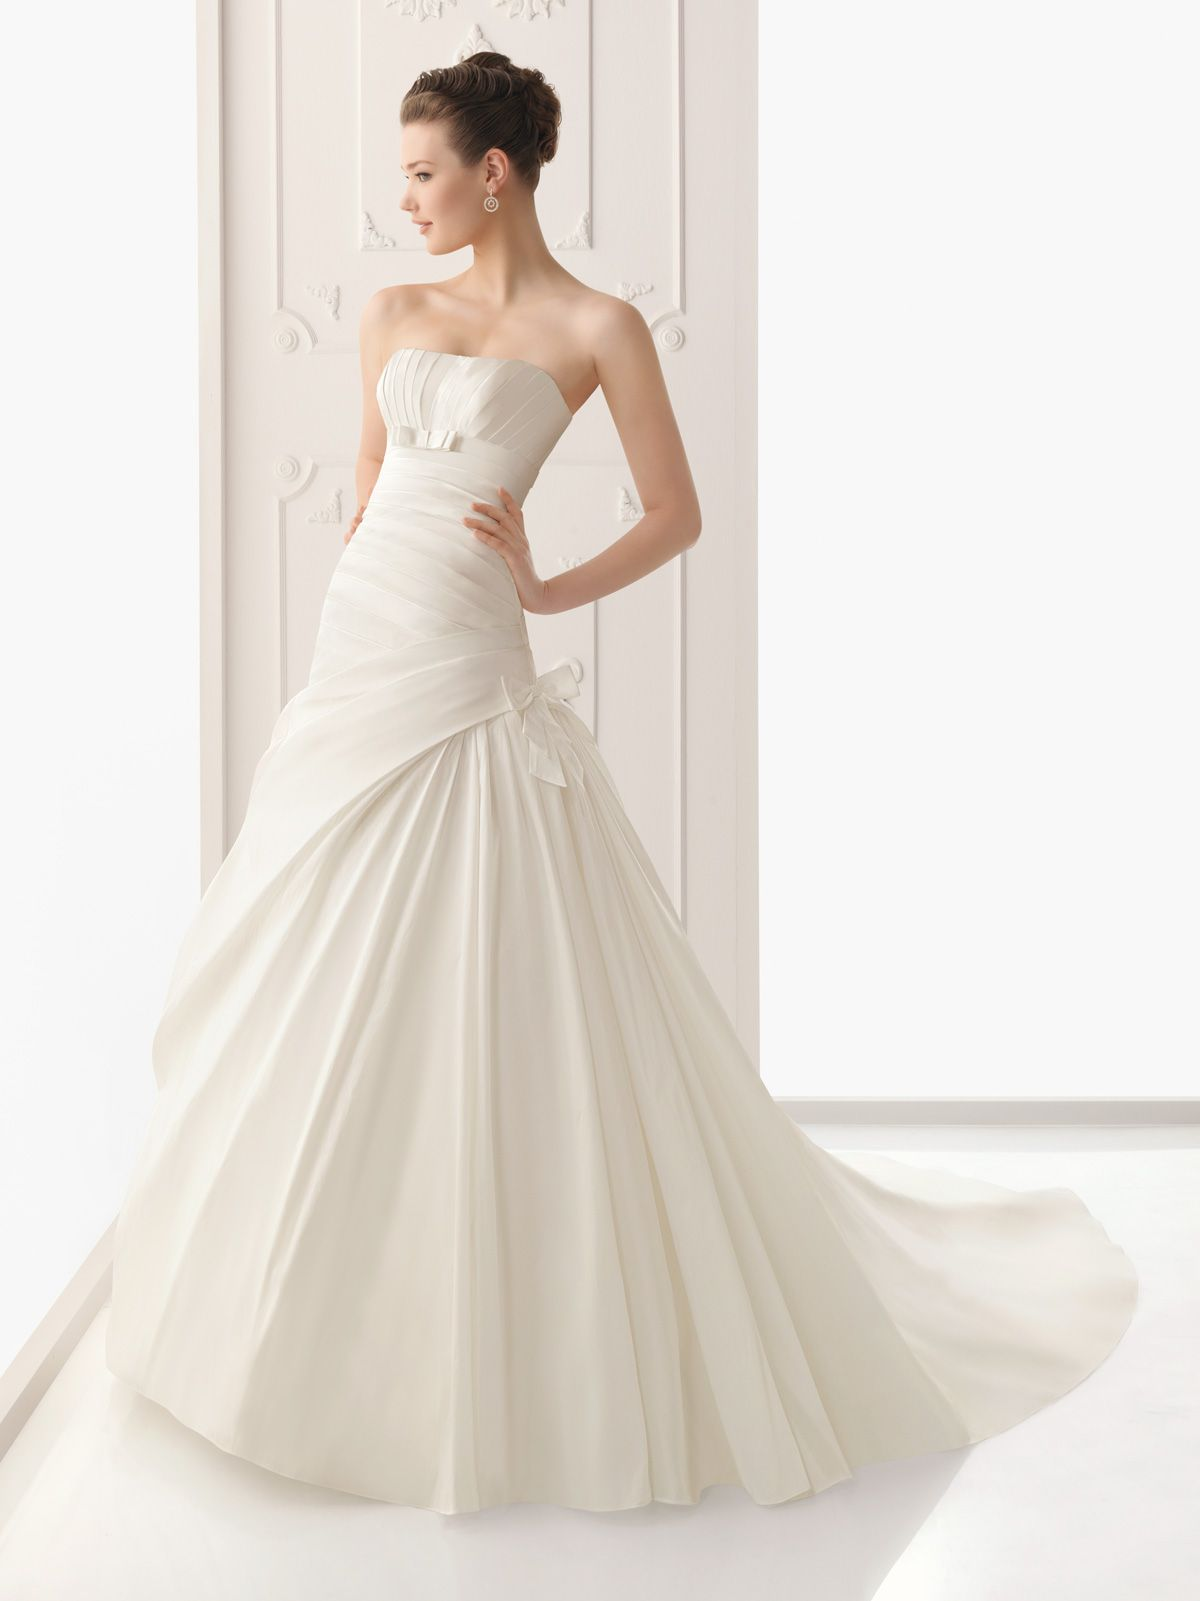 SENDERO   Wedding Dresses   2012 Collection   Alma Novia